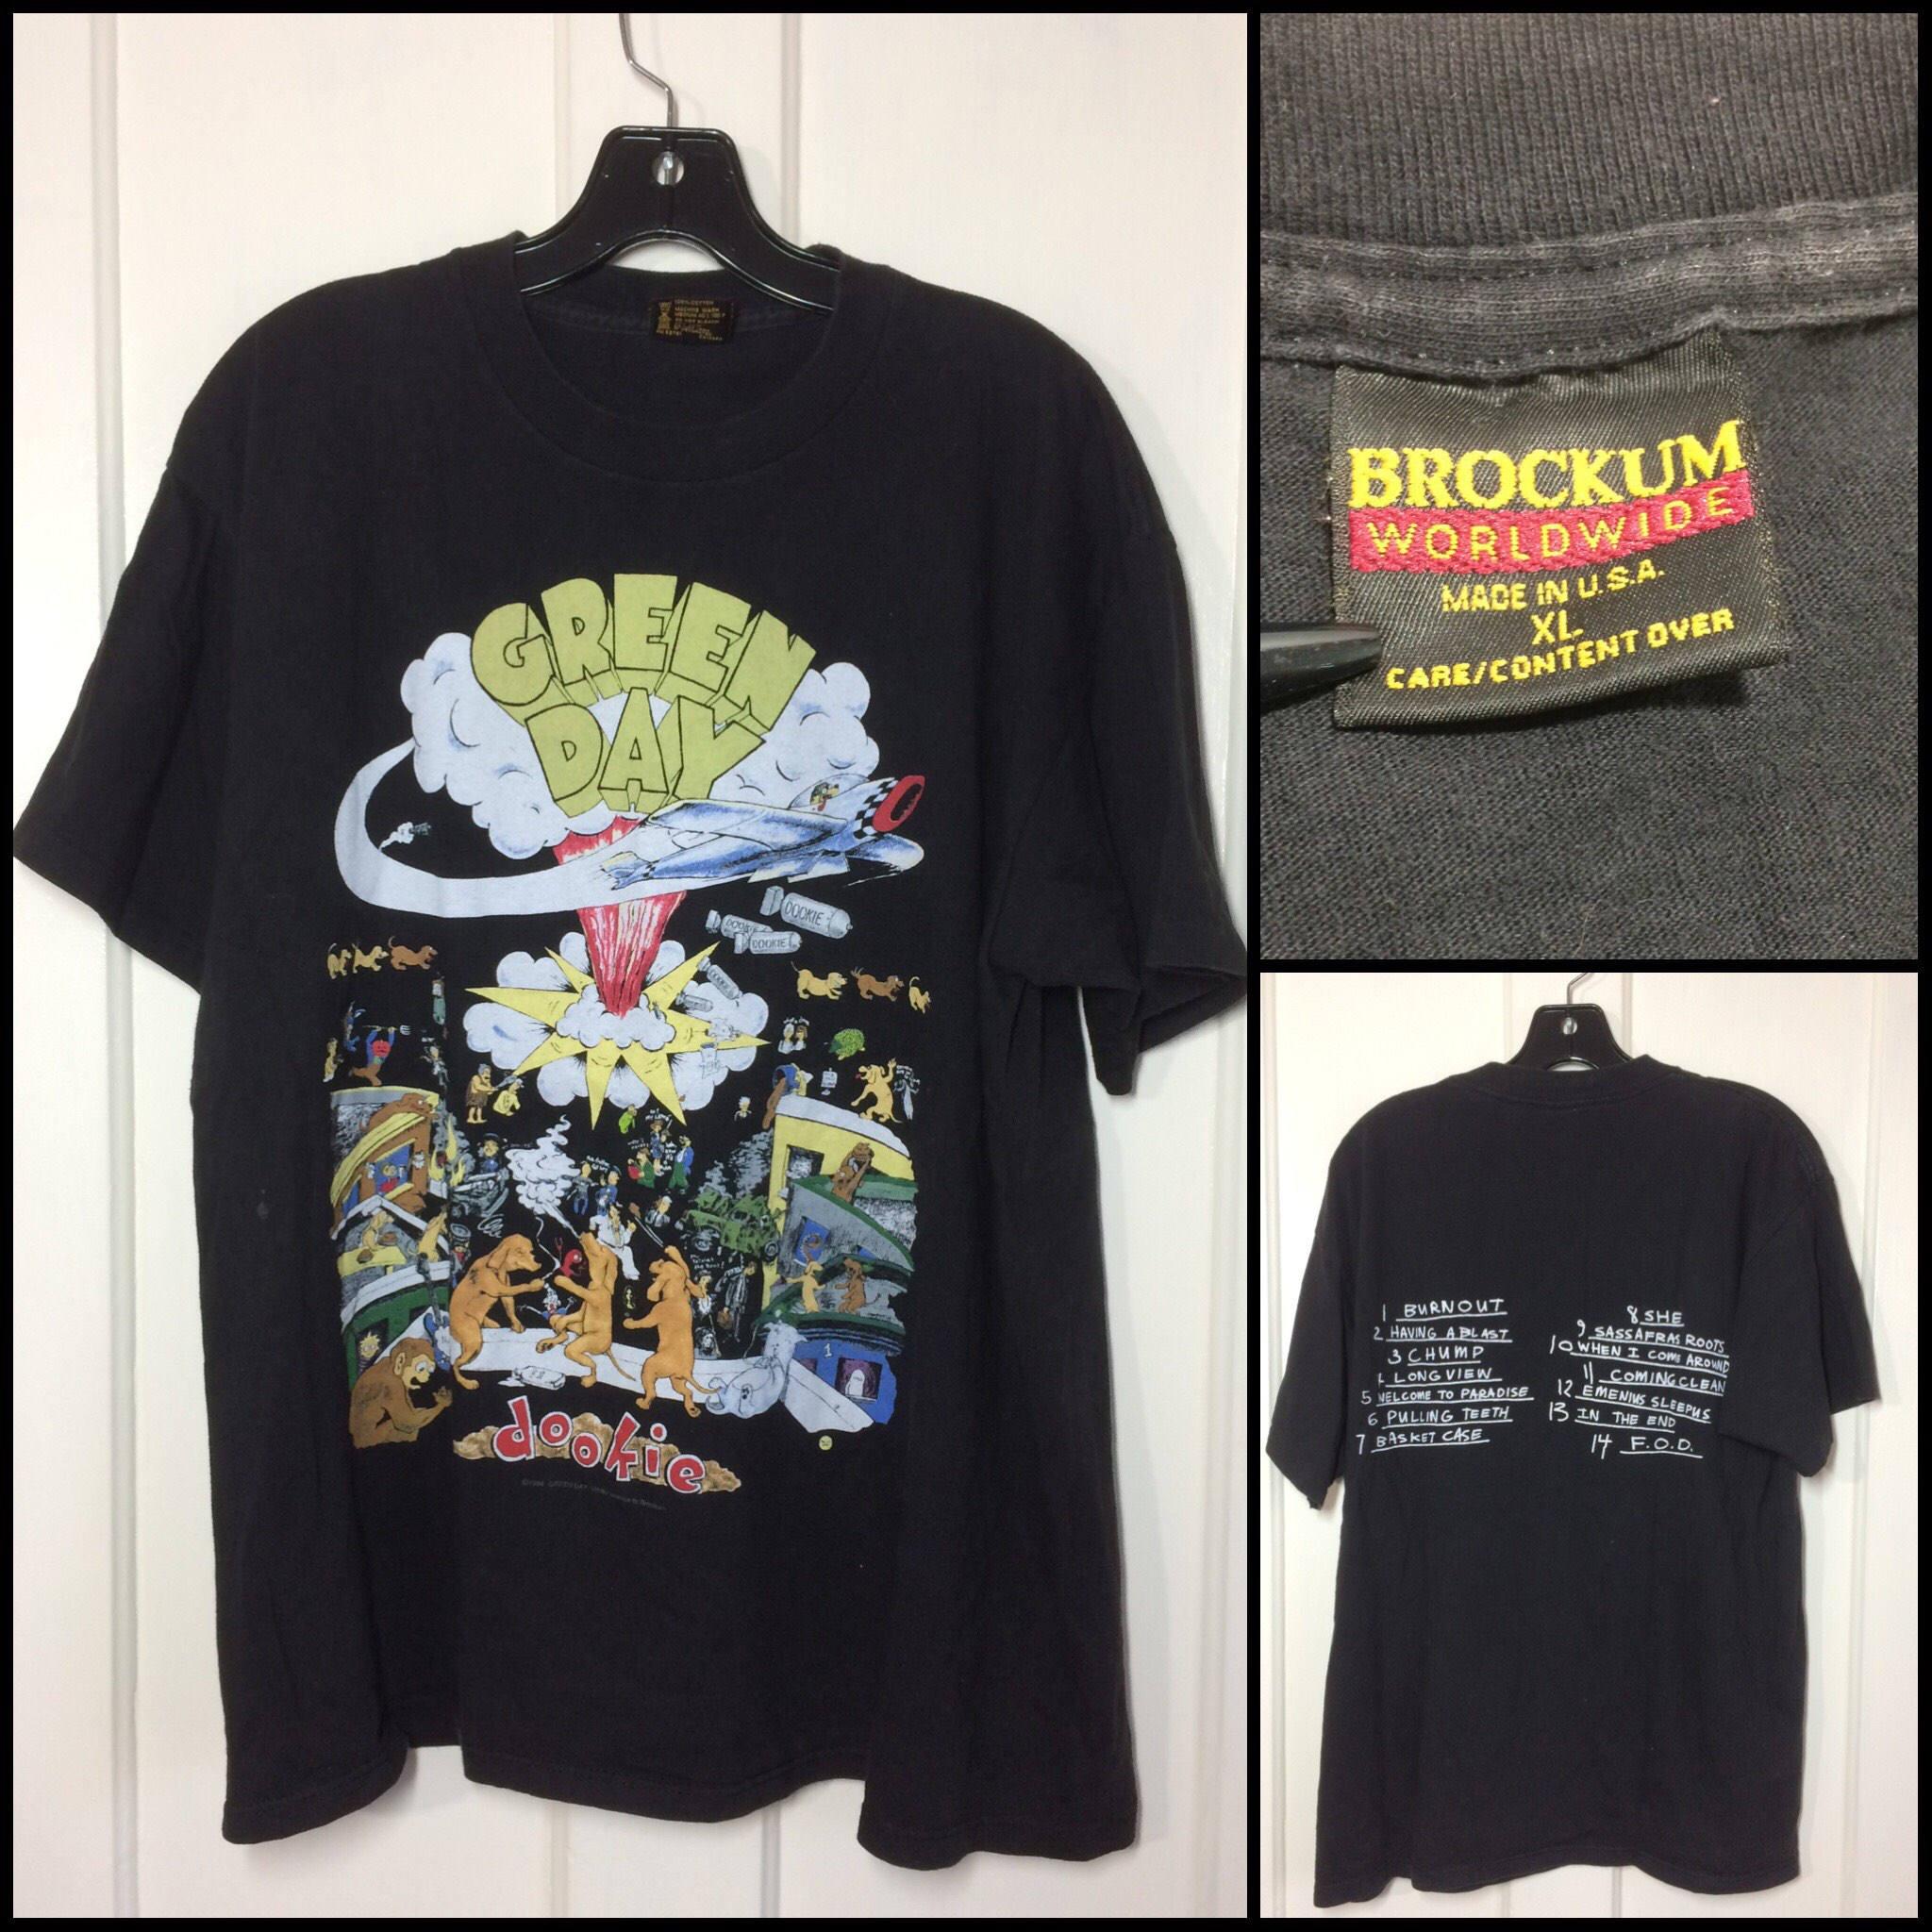 9d5e0ba3a0efa Green Day Rock Band T Shirts - BCD Tofu House